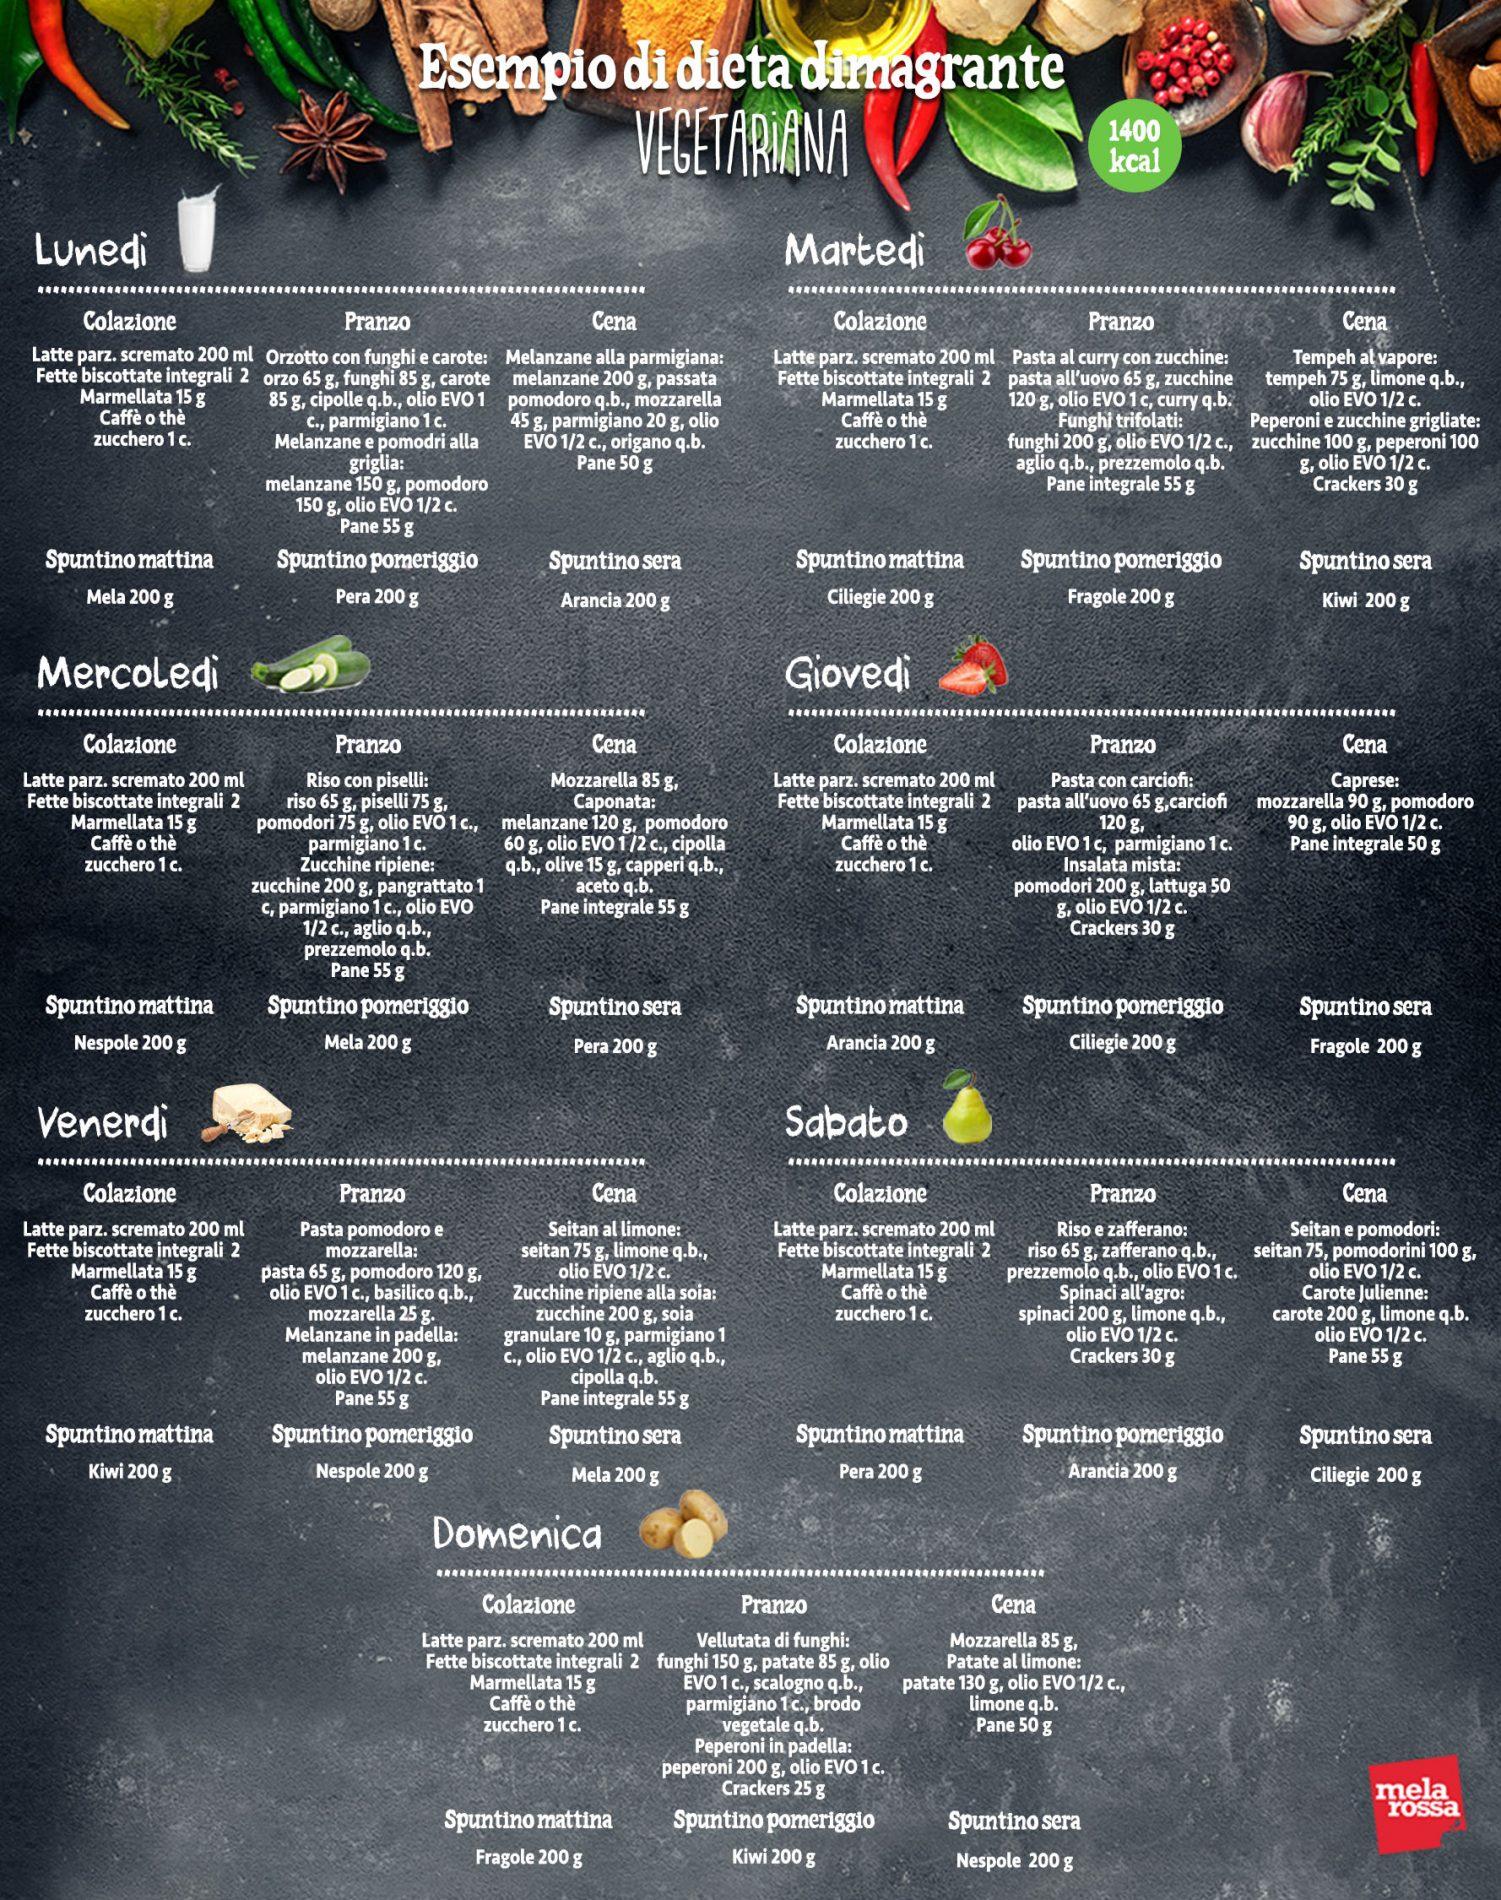 Ricetta Vegetariana Dieta.Dieta Vegetariana I Consigli Del Nutrizionista Melarossa